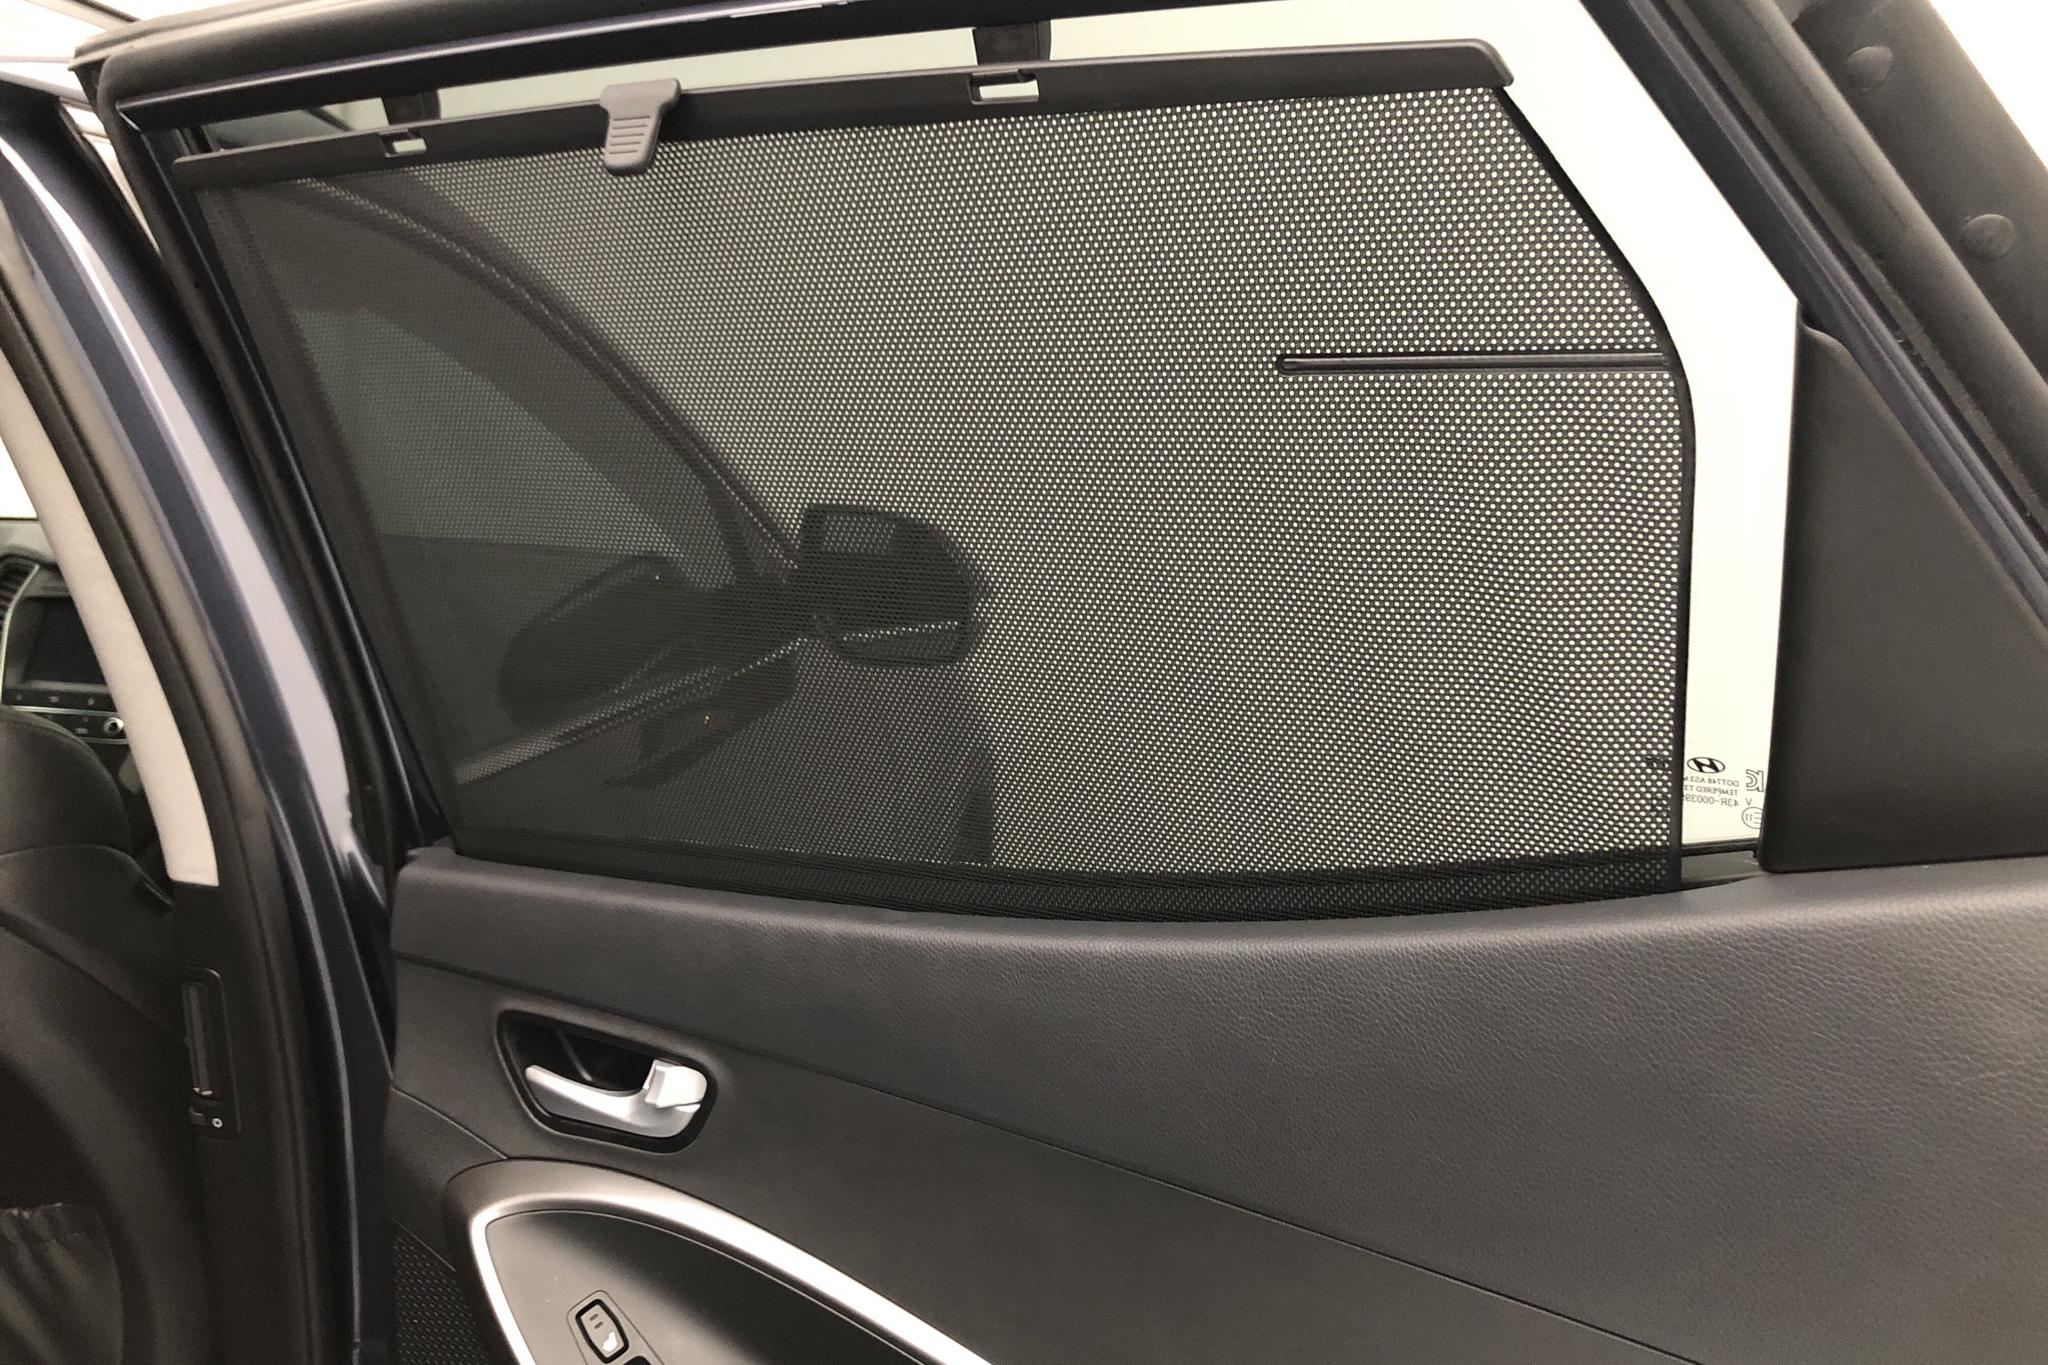 Hyundai Santa Fé 2.2 D 4WD (200hk) - 17 930 km - Automatic - Dark Blue - 2017